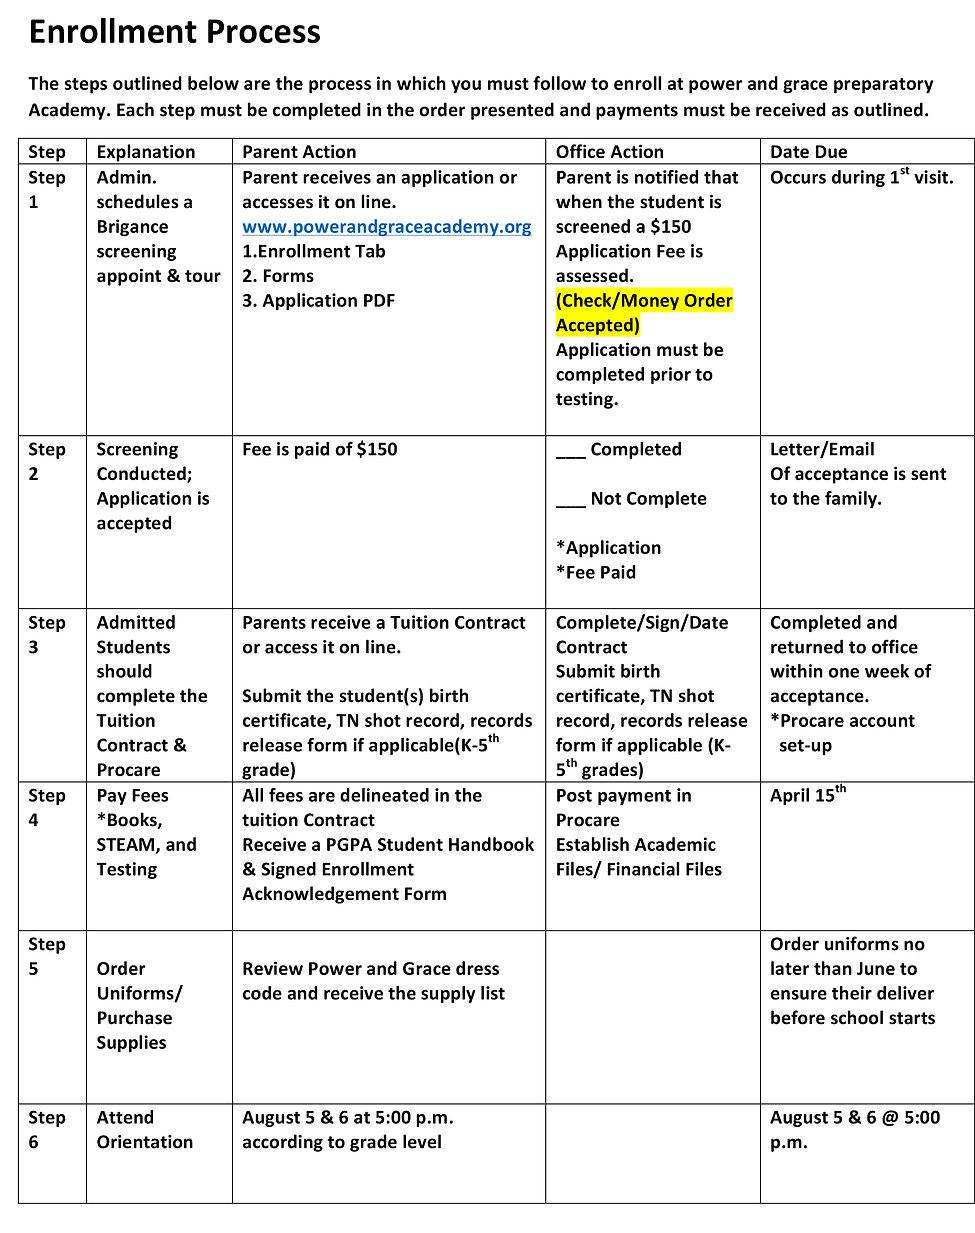 Enrollment Process 2021.jpg